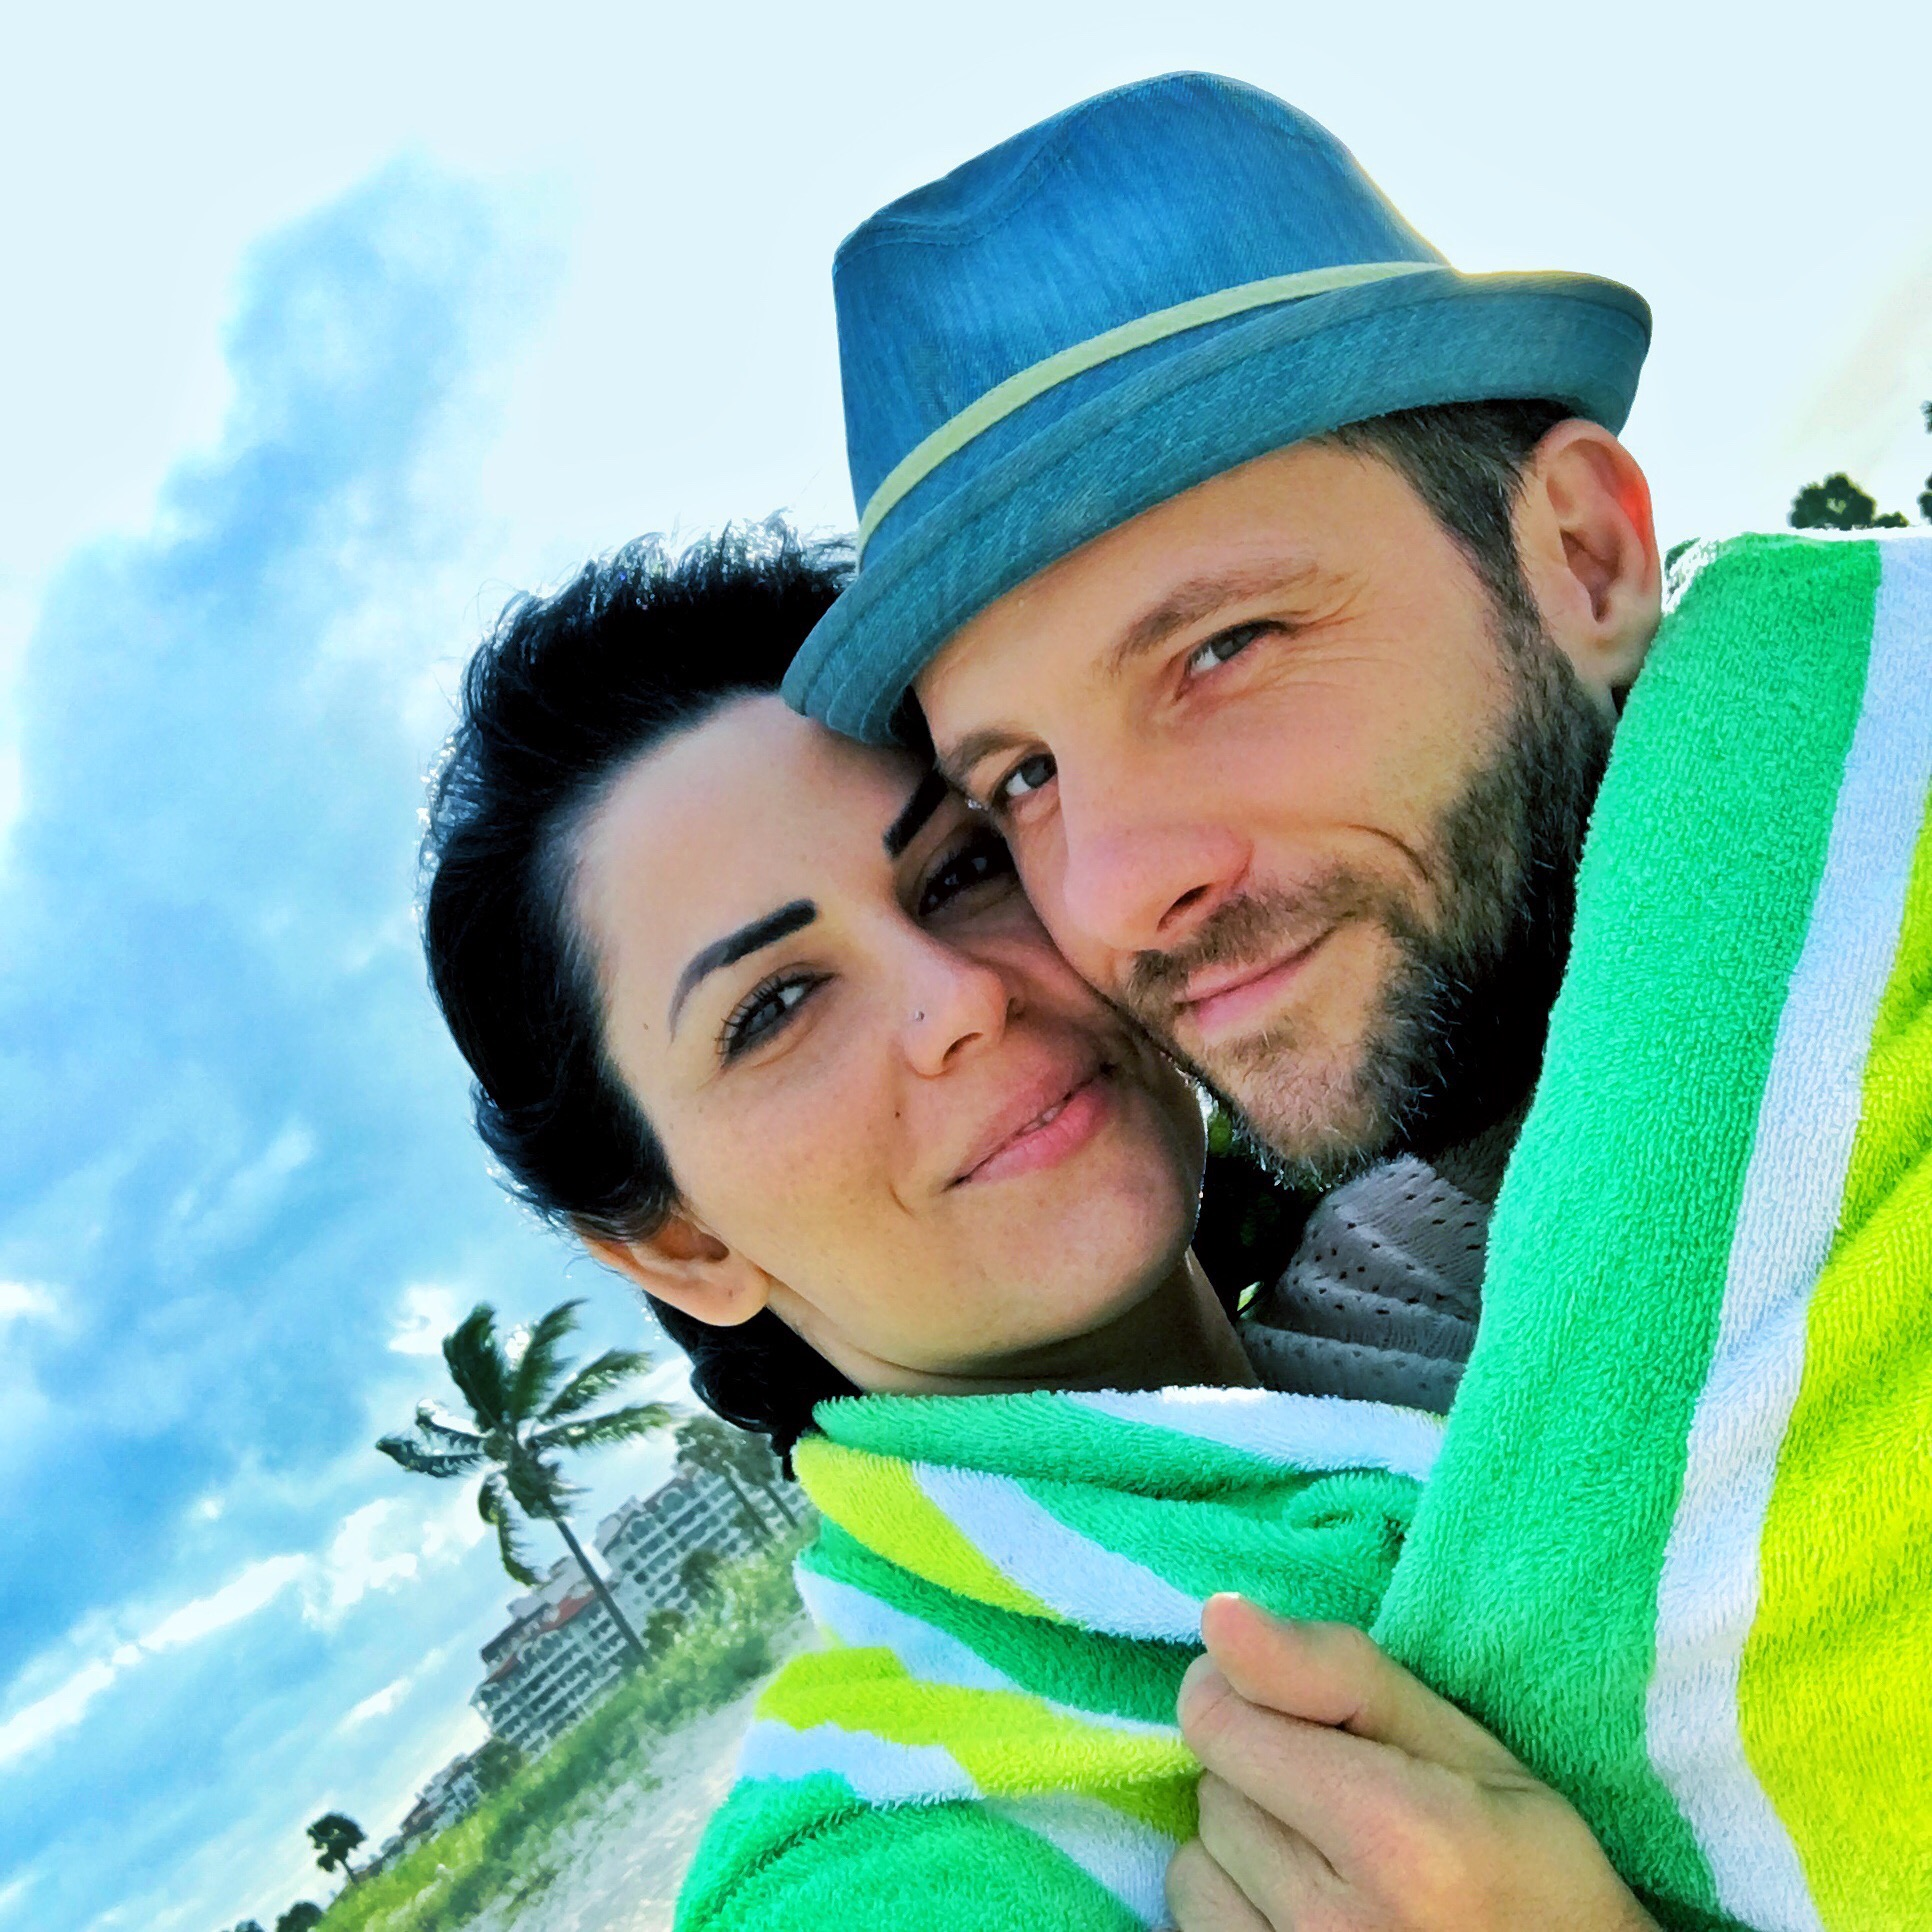 Bryan Reeves & Silvy Khoucasian